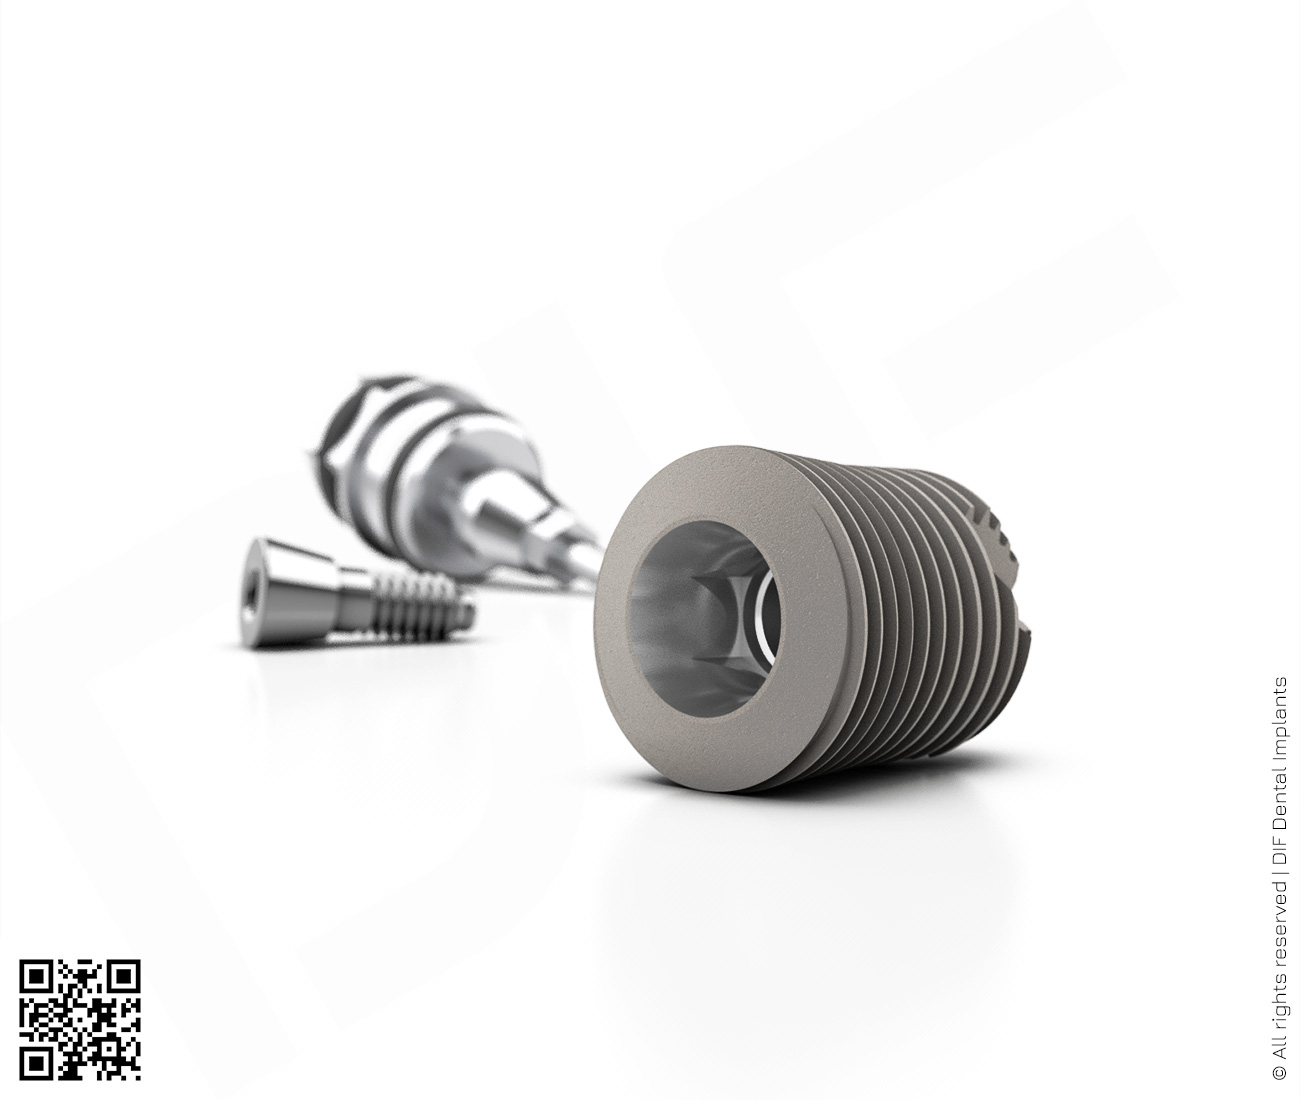 Фото имплантат mainstream fine d6.0 мм – l8.0 мм  производства DIF.